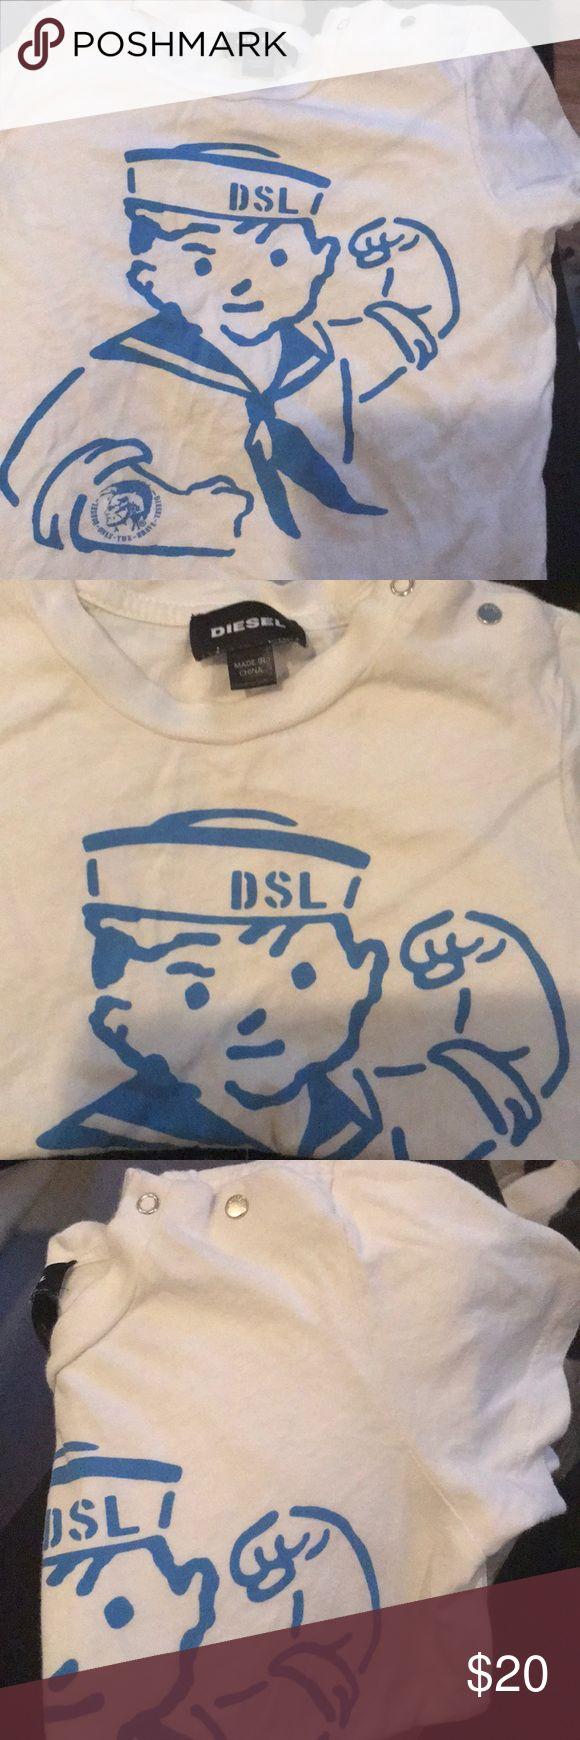 Little boys diesel T shirt Blue sailor little guy logo wore once Limited addition U neck T-shirt Diesel Shirts & Tops Tees - Short Sleeve